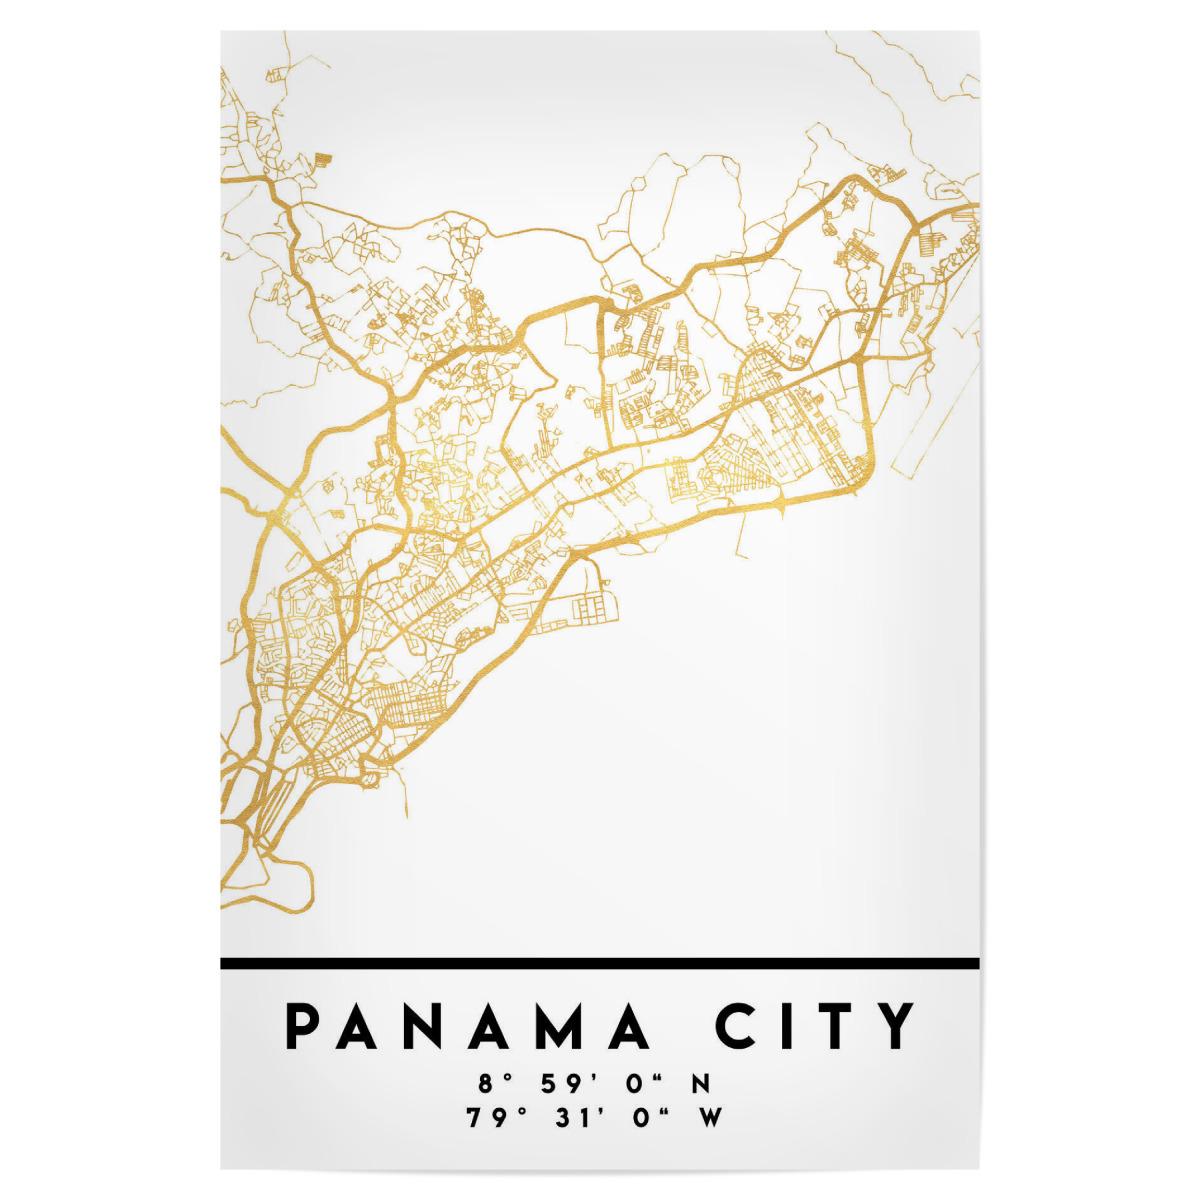 PANAMA CITY STREET MAP ART als Poster bei artboxONE kaufen